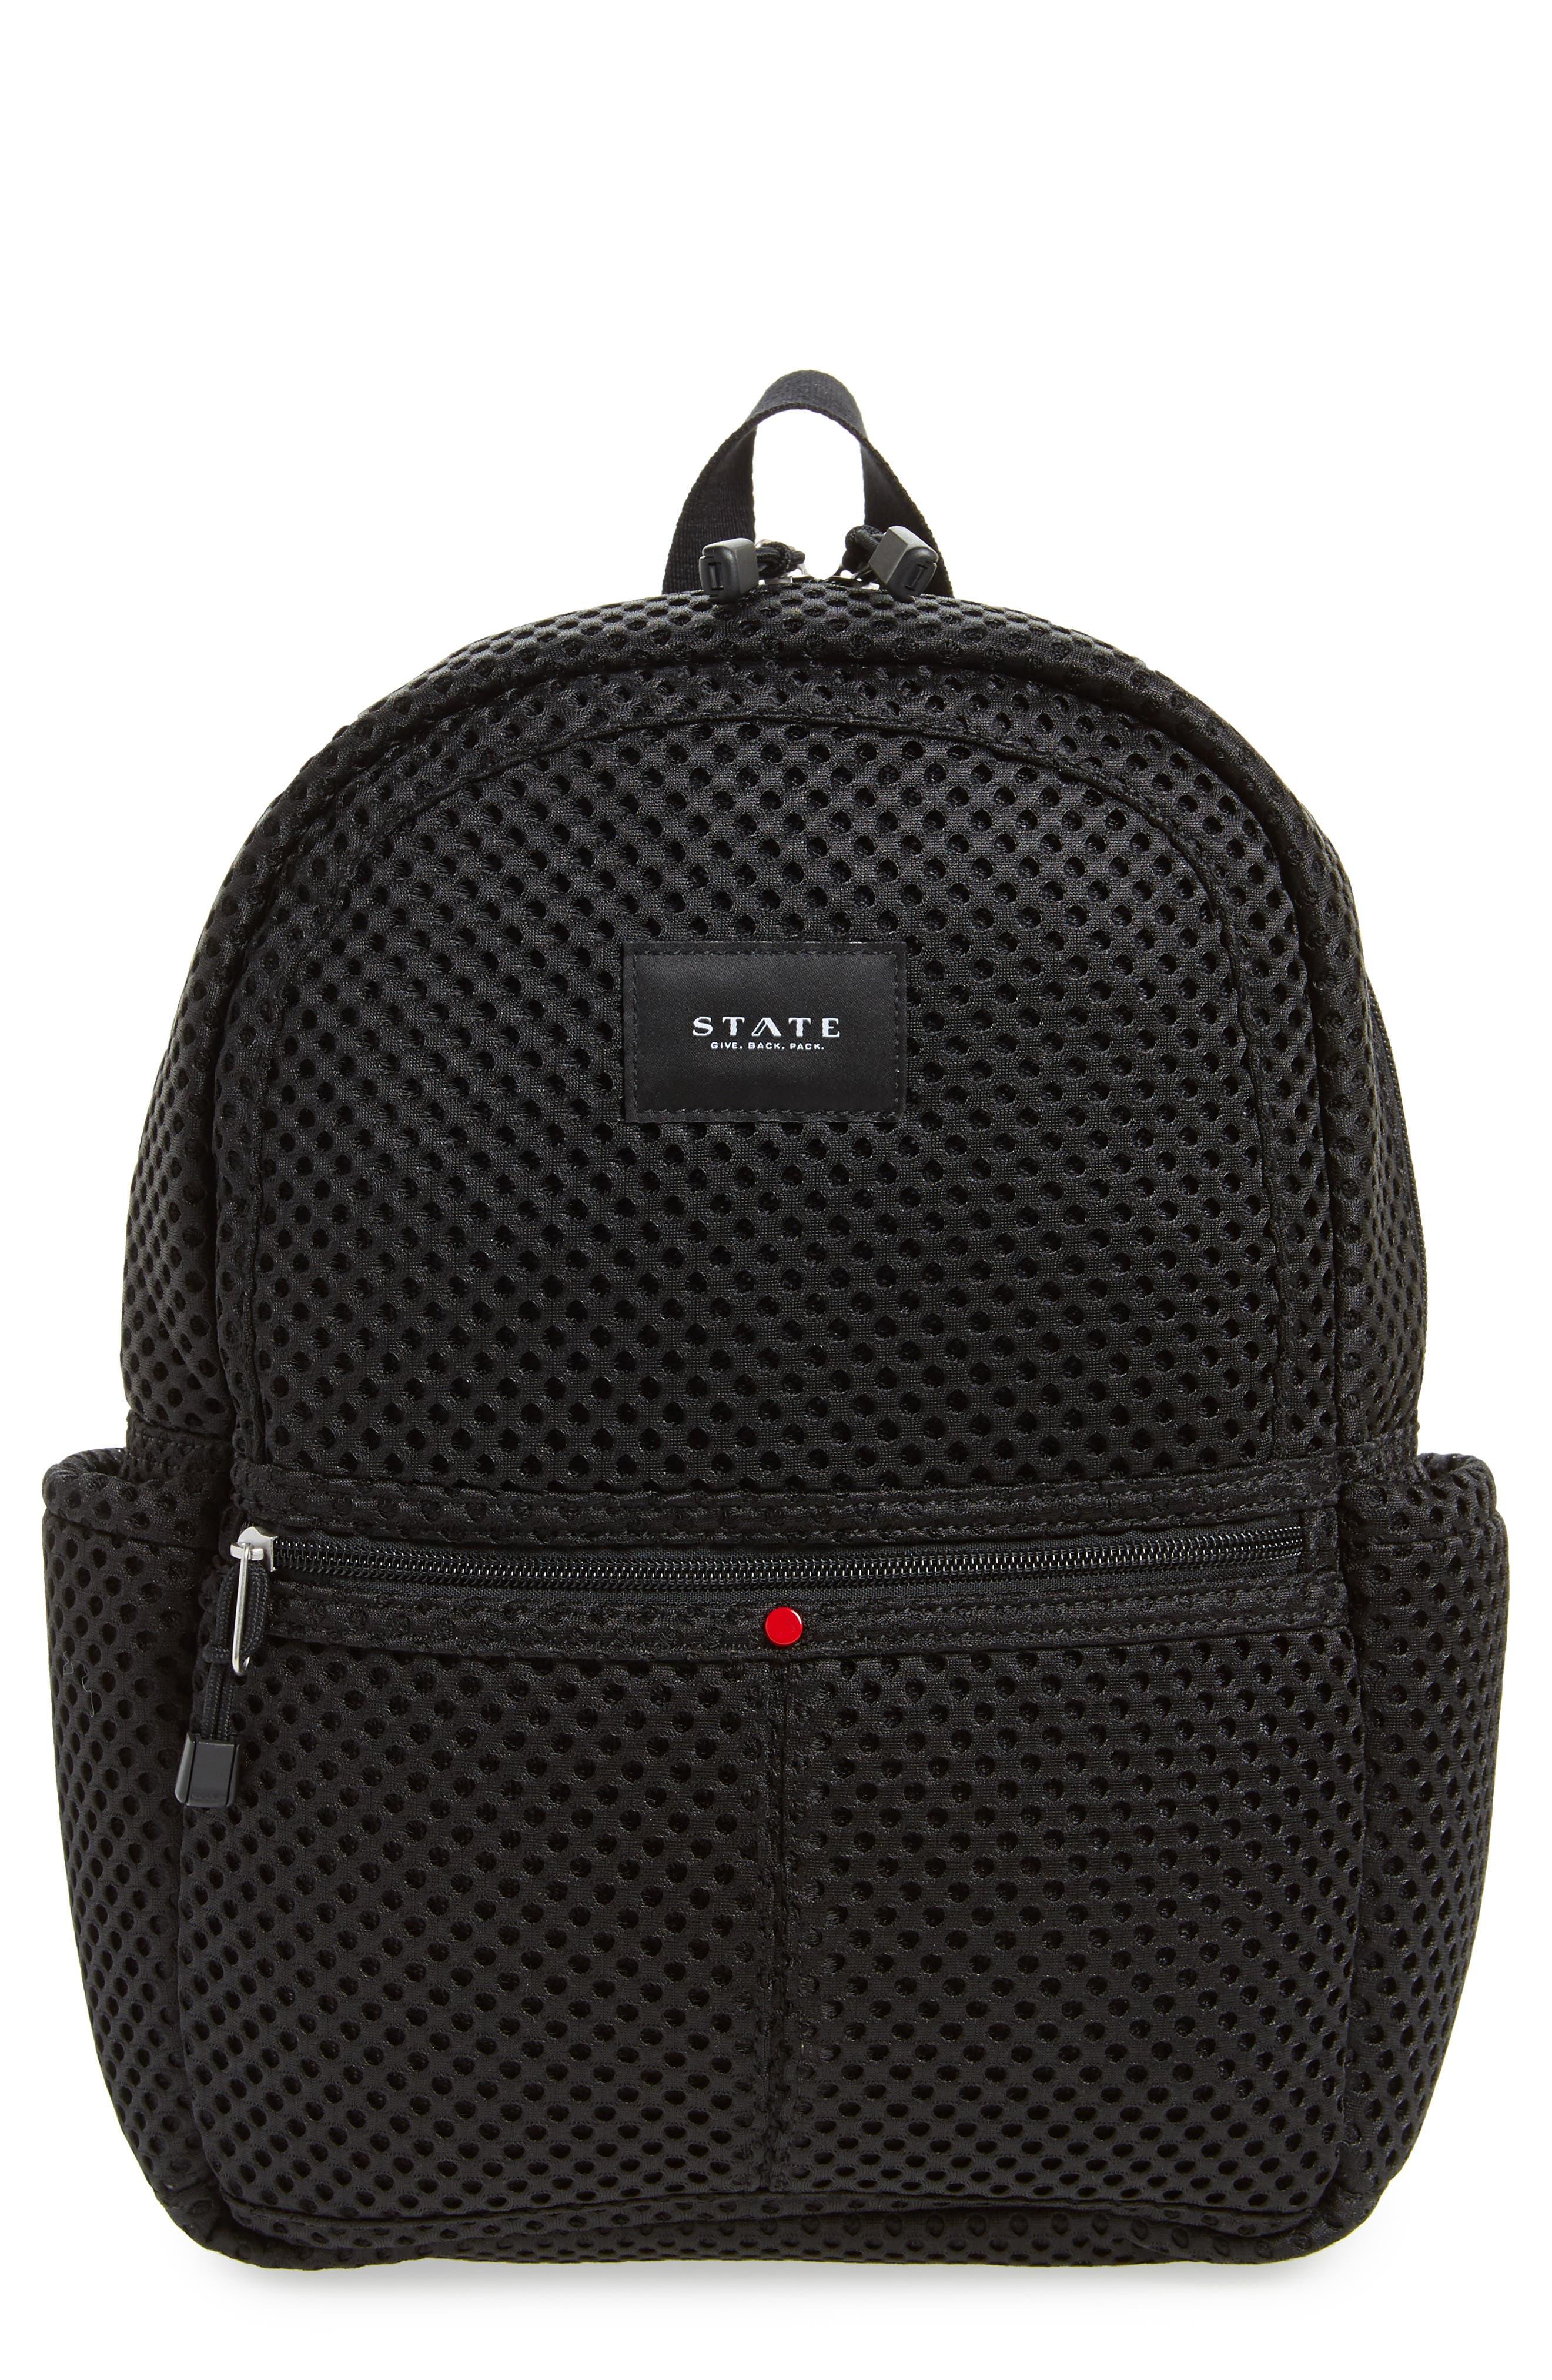 Lacrosse Mesh Kane Backpack,                             Main thumbnail 1, color,                             Black